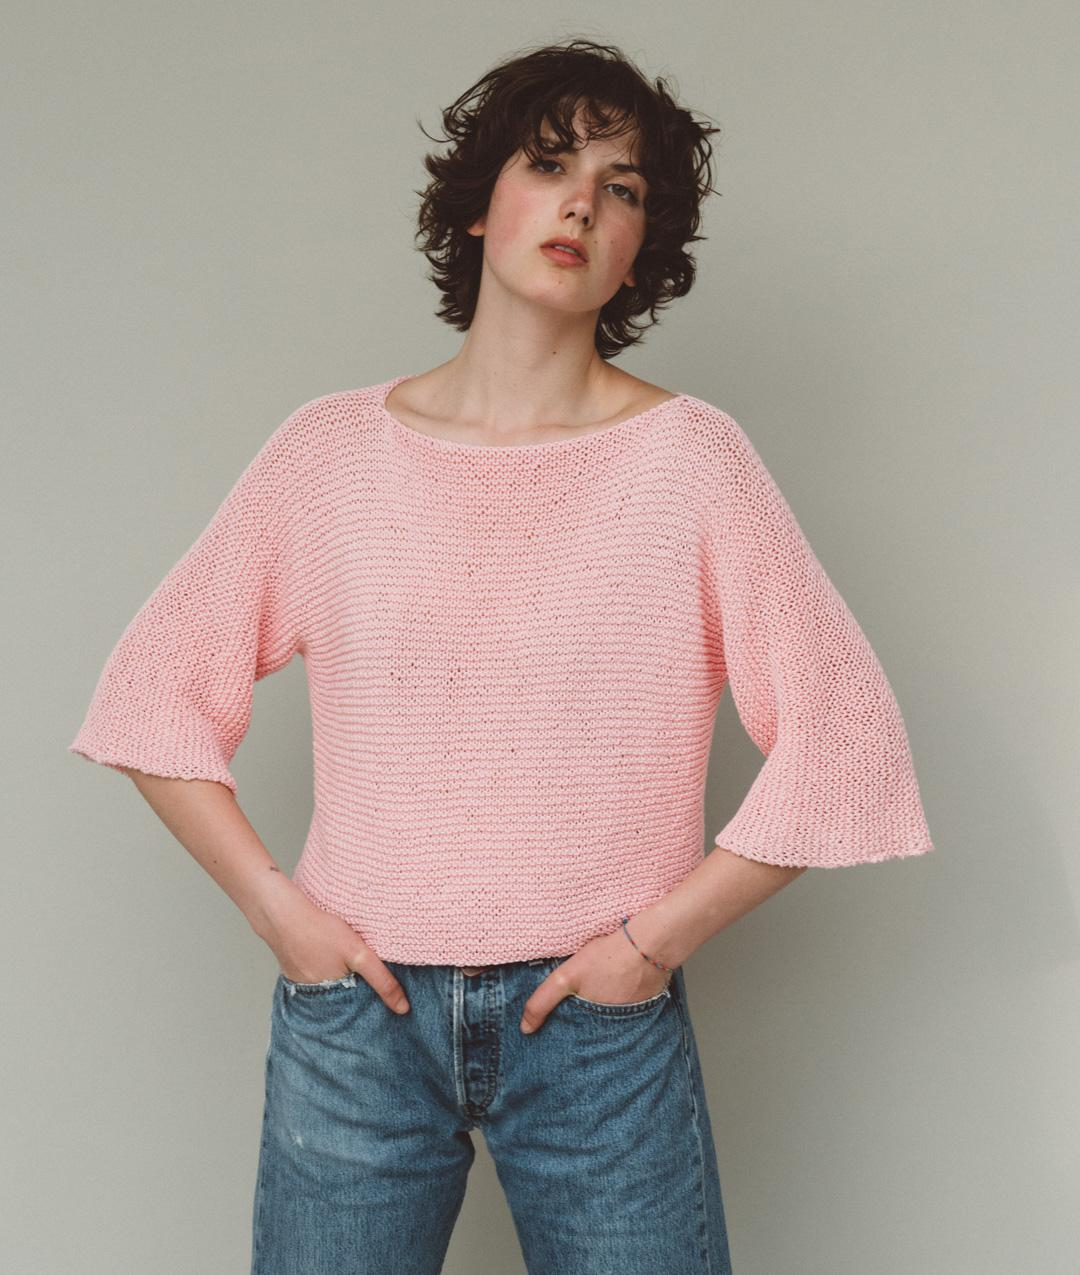 Maglie e Top - Cotone - Tulip T-Shirt - 1